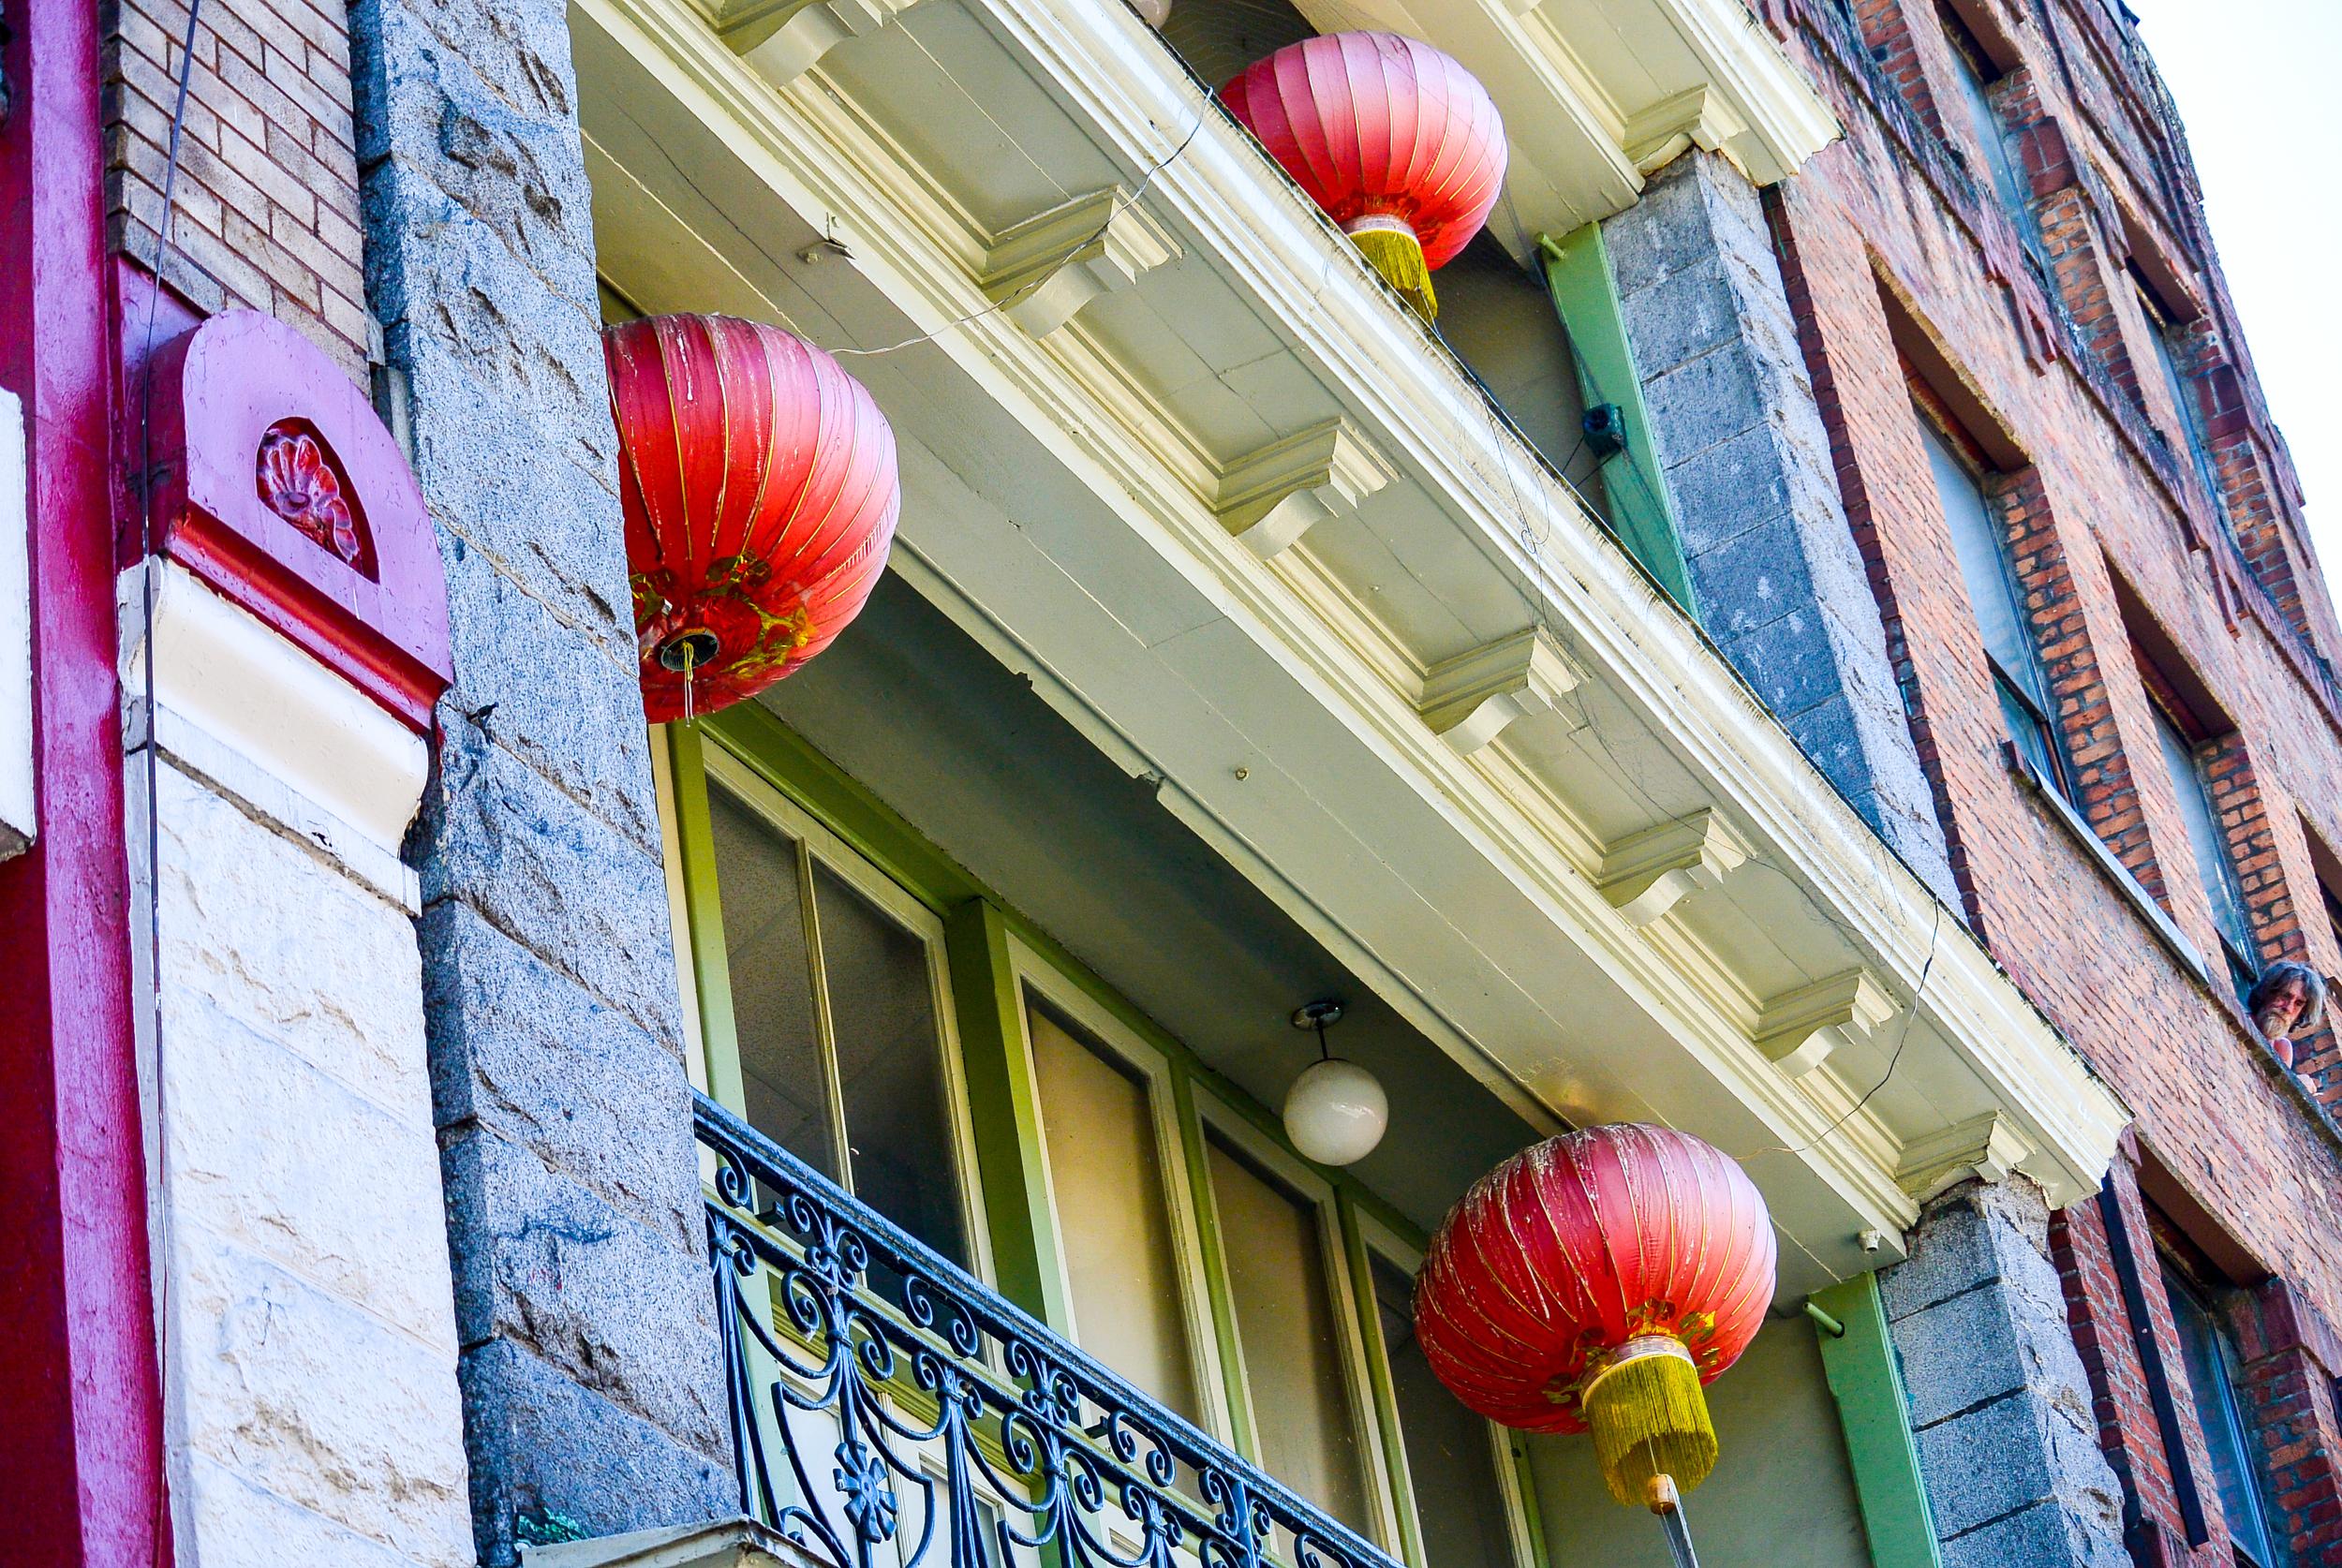 Vancouver Chinatown Lanterns